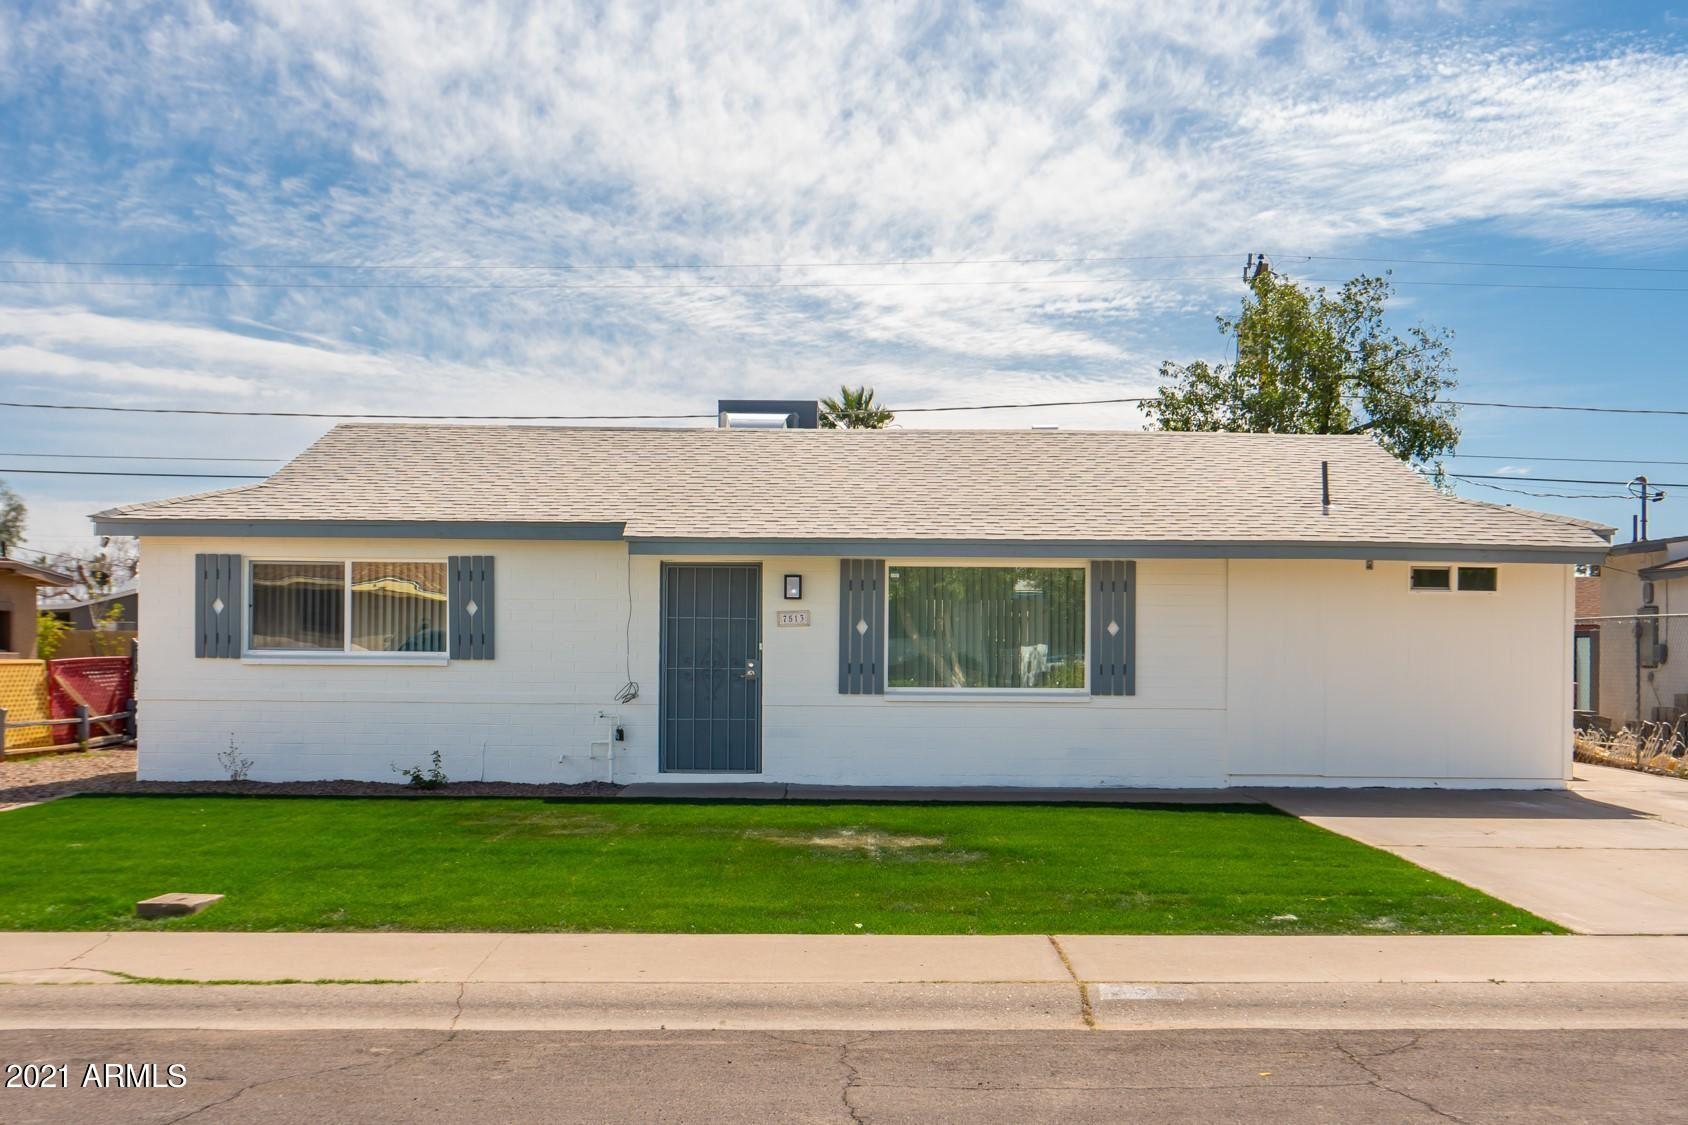 7513 E MCKINLEY Street, Scottsdale, AZ 85257 - MLS#: 6208185